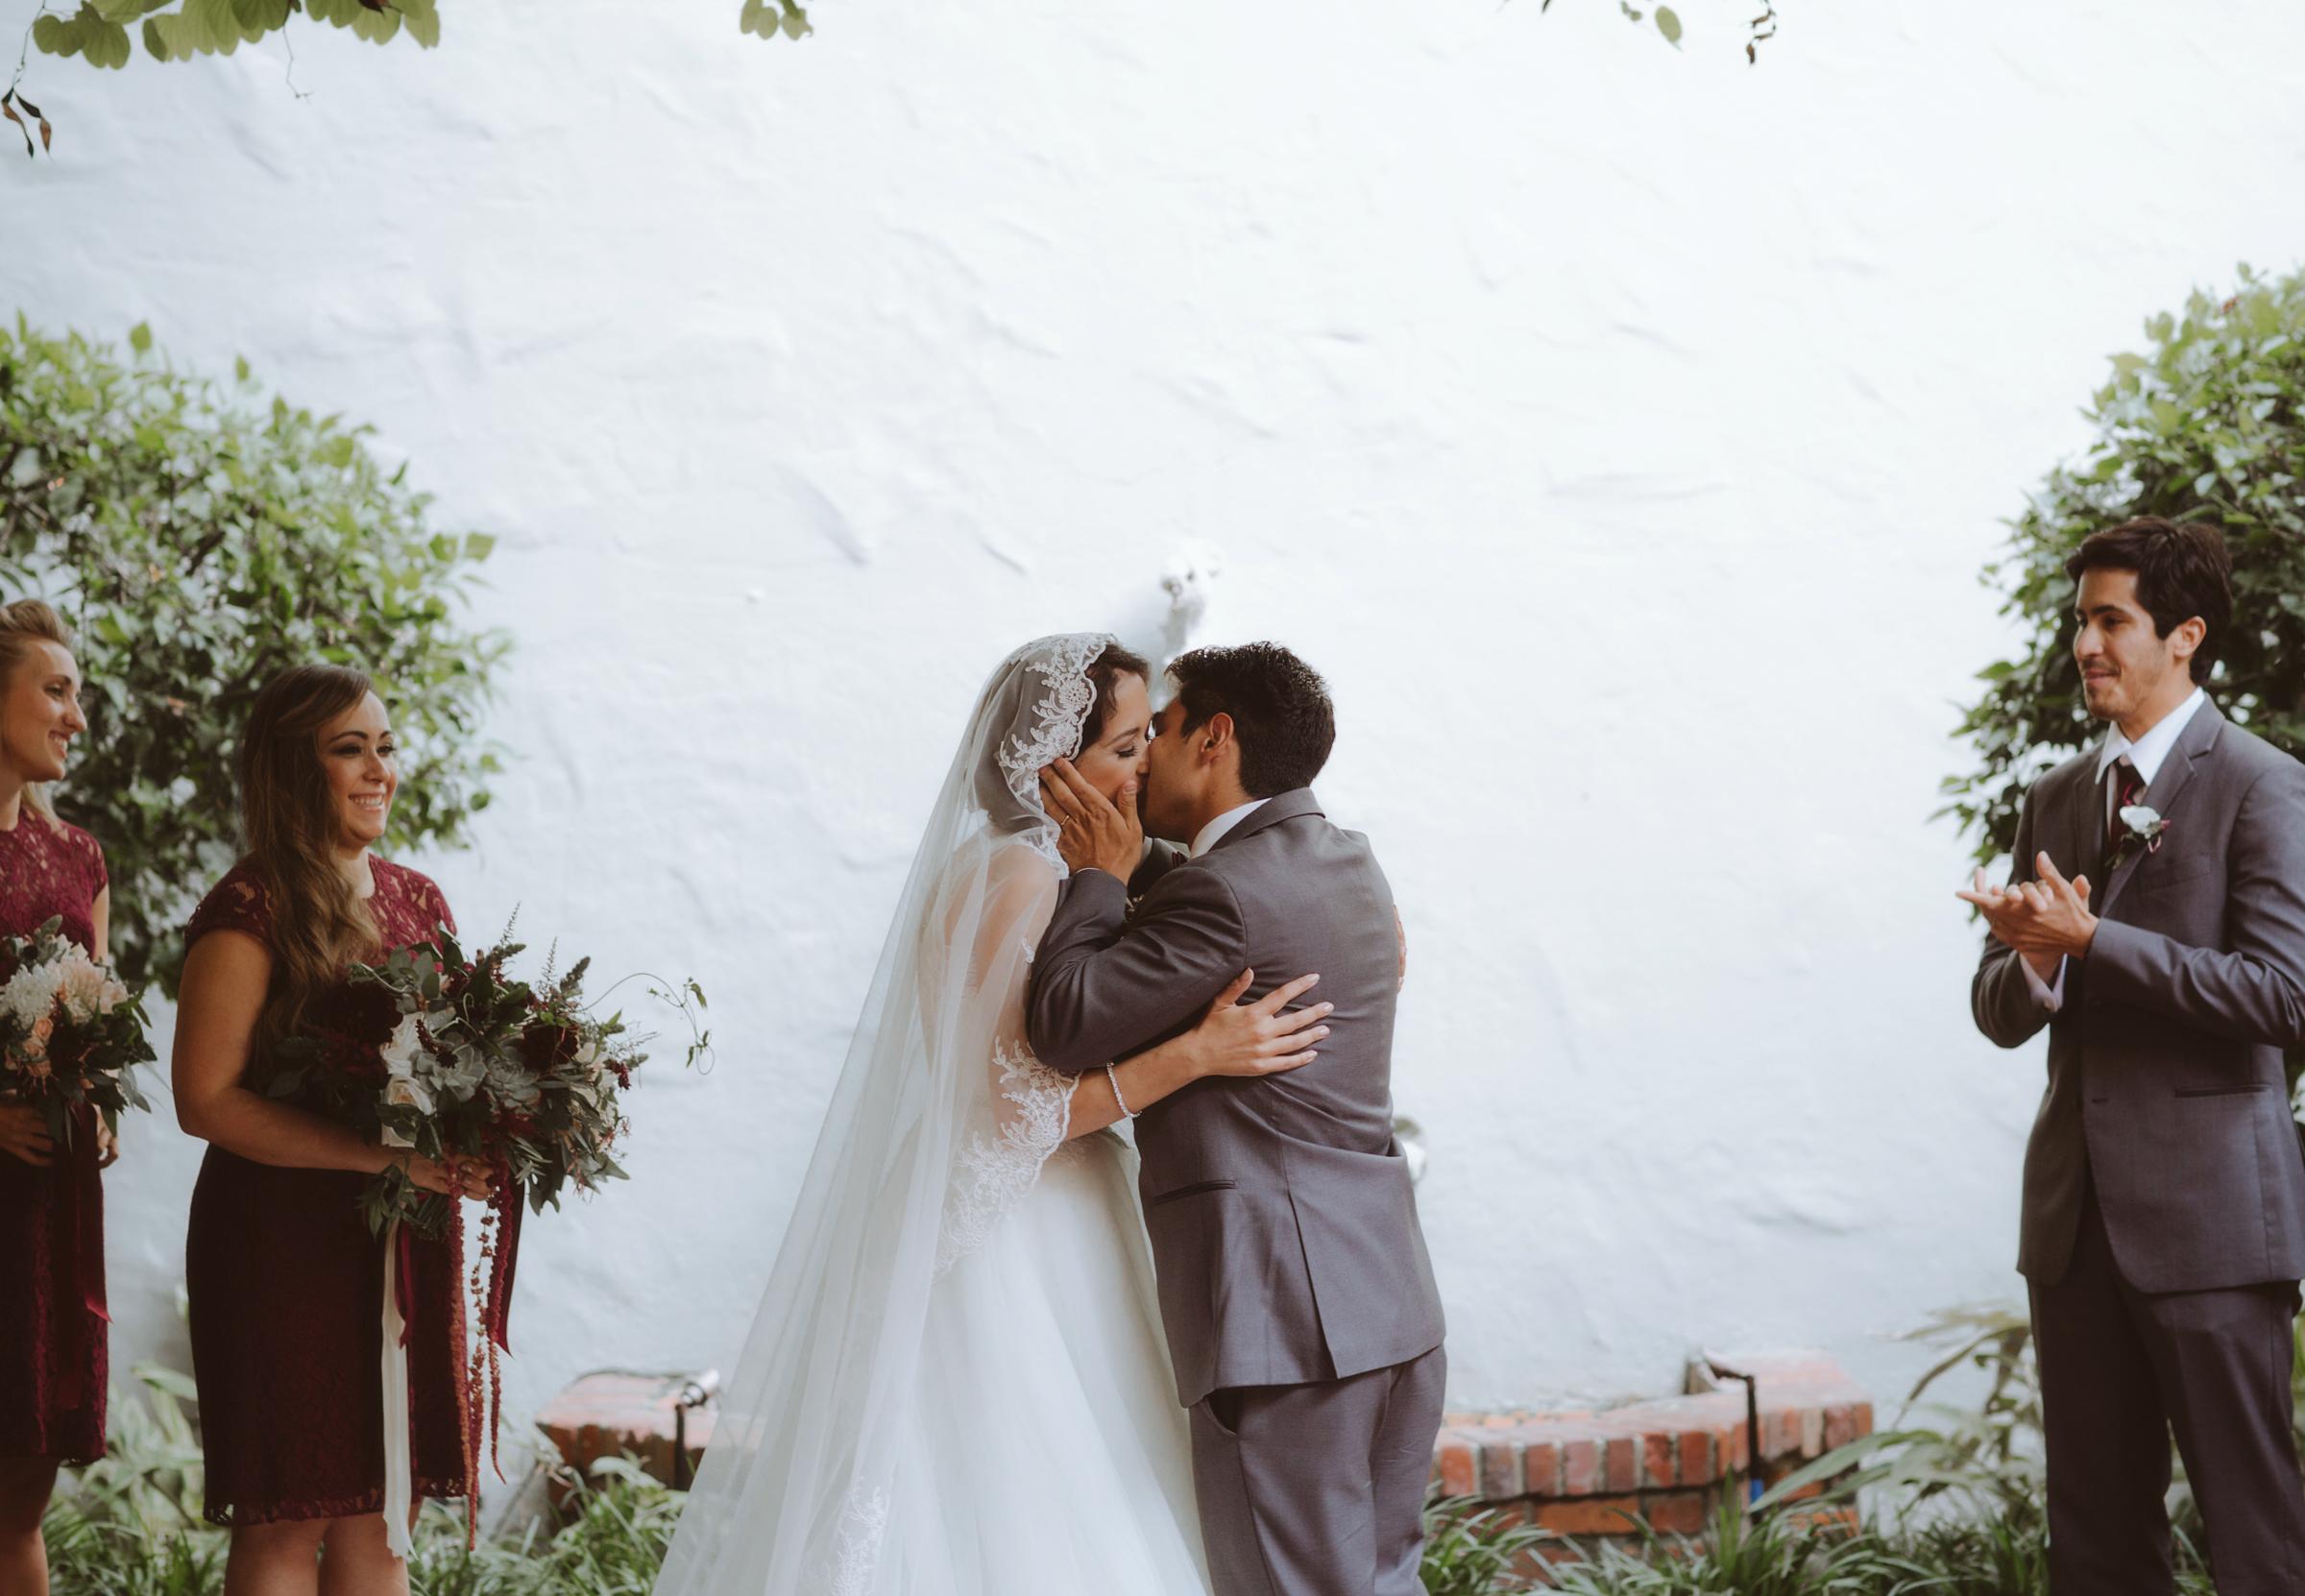 wedding day | MFA St Pete | Vanessa Boy Photography | vanessaboy.com-381.com |final.jpg